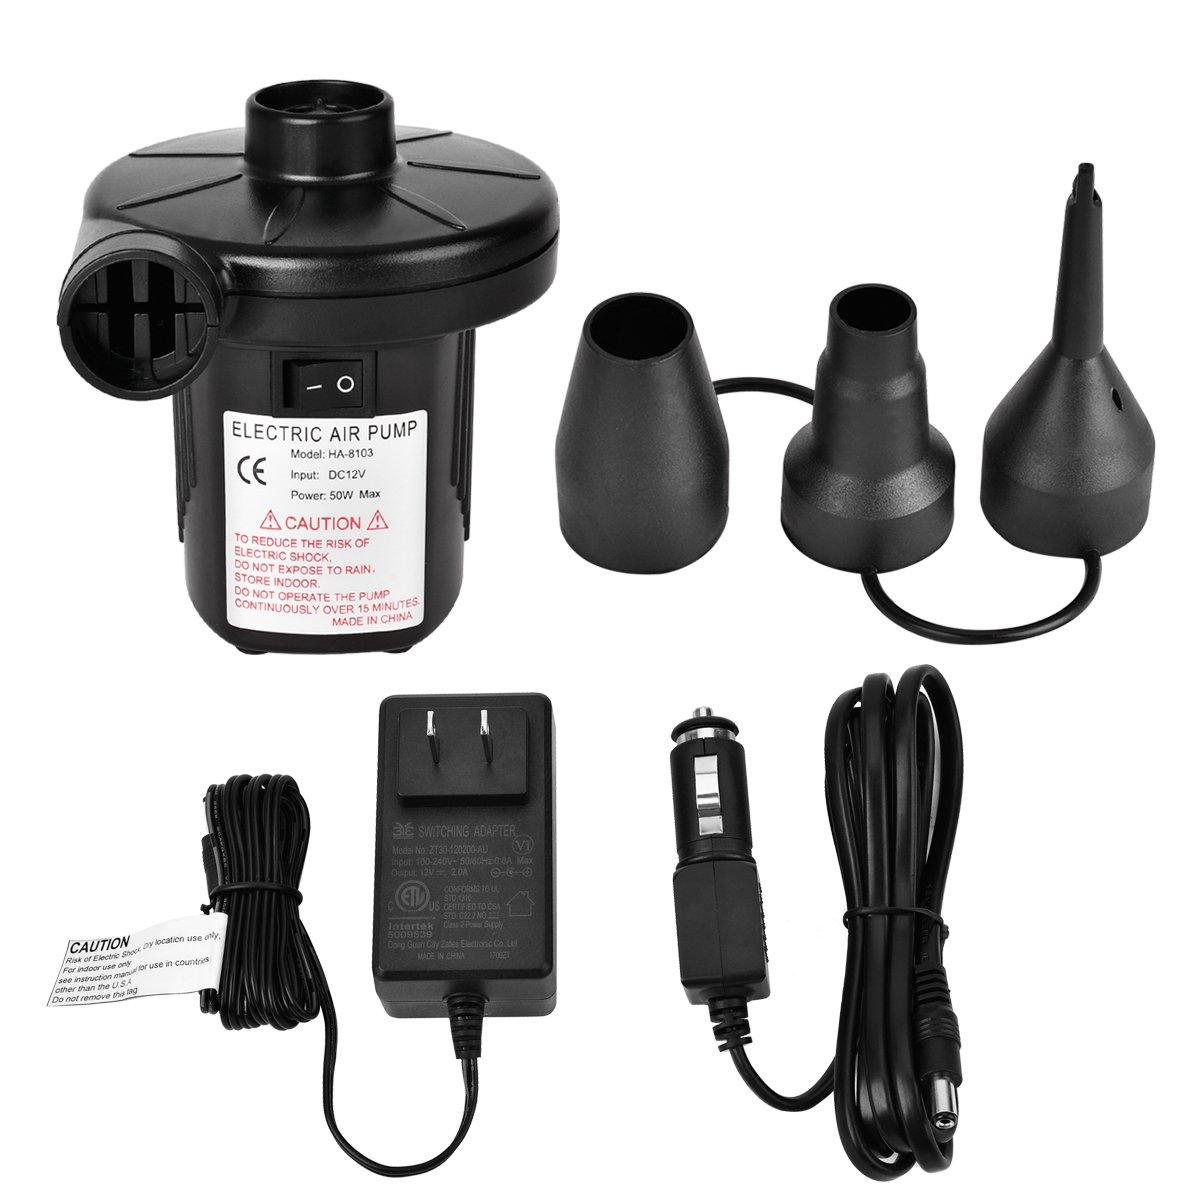 CUGLB Electric Portable Air Pump 110V AC/12V DC Quick-Fill Air Pump for Inflatables Air Mattress Raft Bed Boat Pool Toy